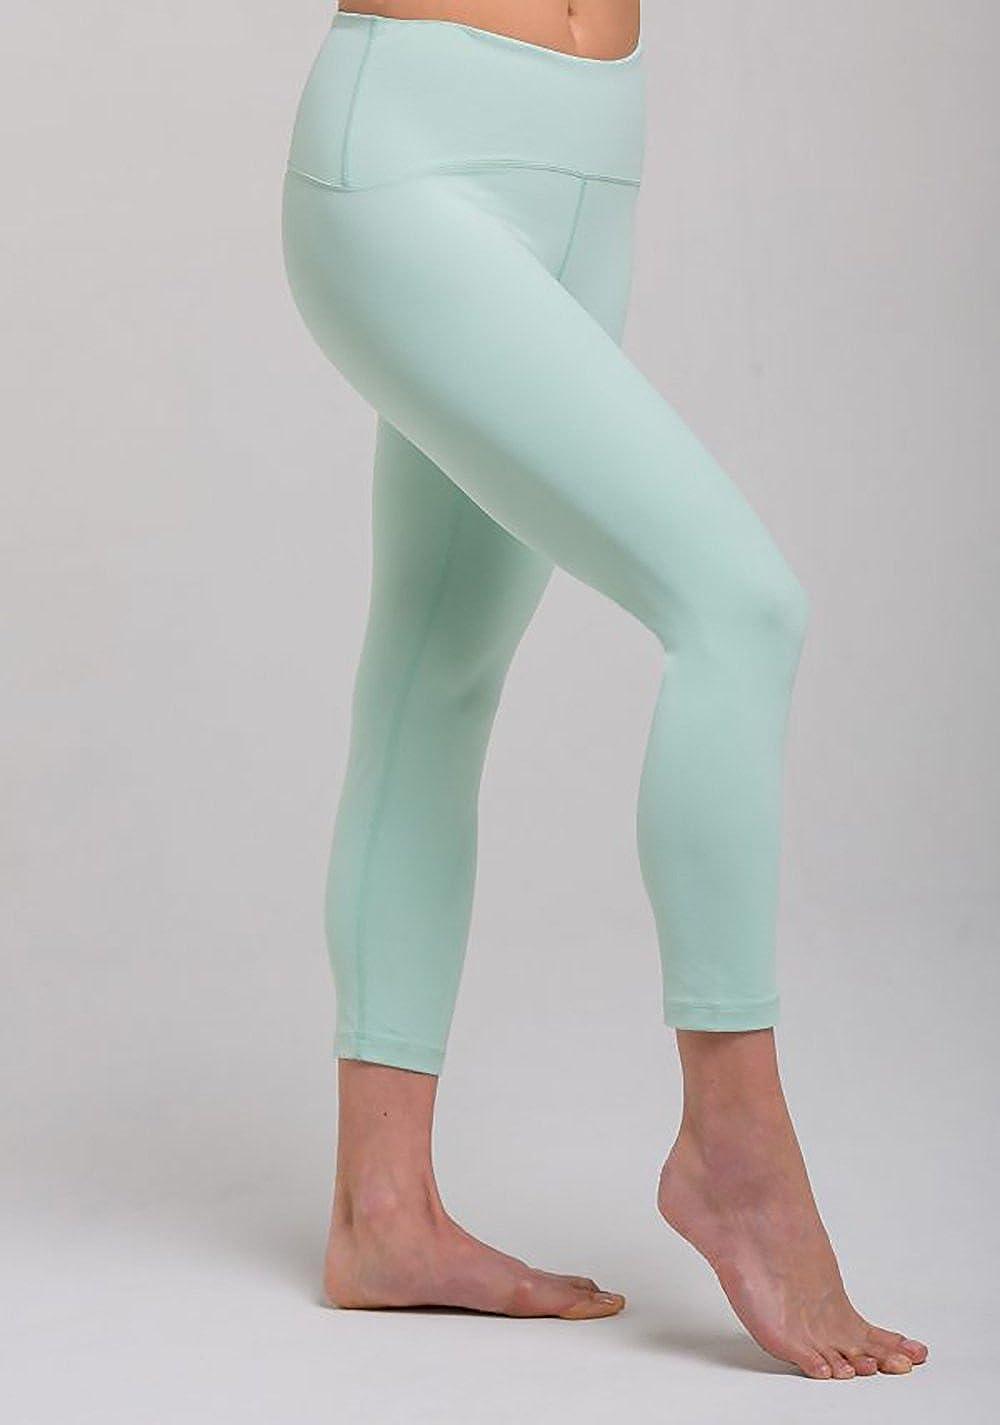 Amazon.com: tanya-b Womens Yoga Three-Quarter Legging Pants ...